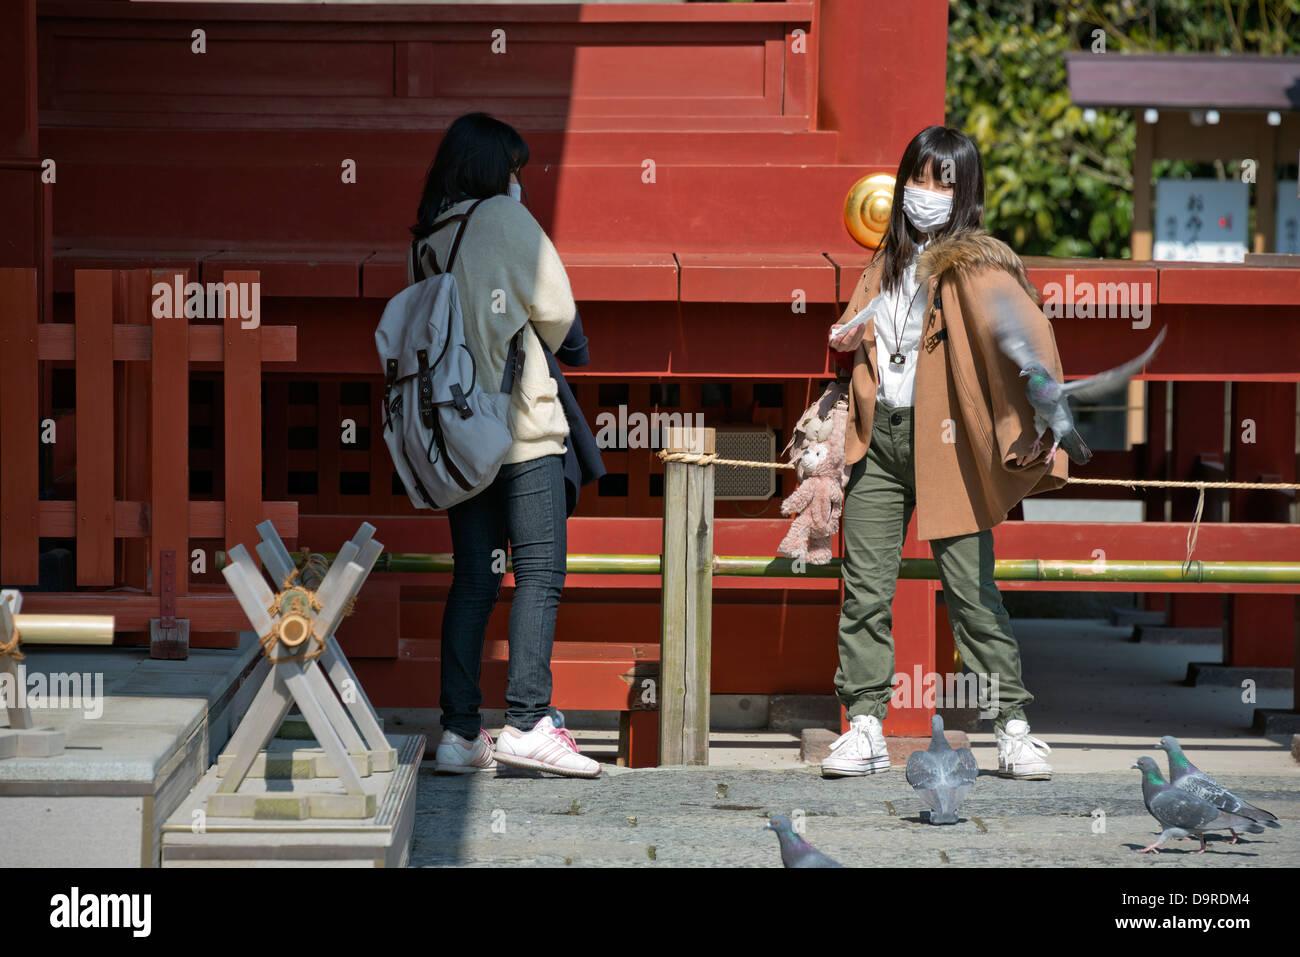 Japanese tourists at Tsurugaoka Hachimangu Shrine, Kamakura Stock Photo